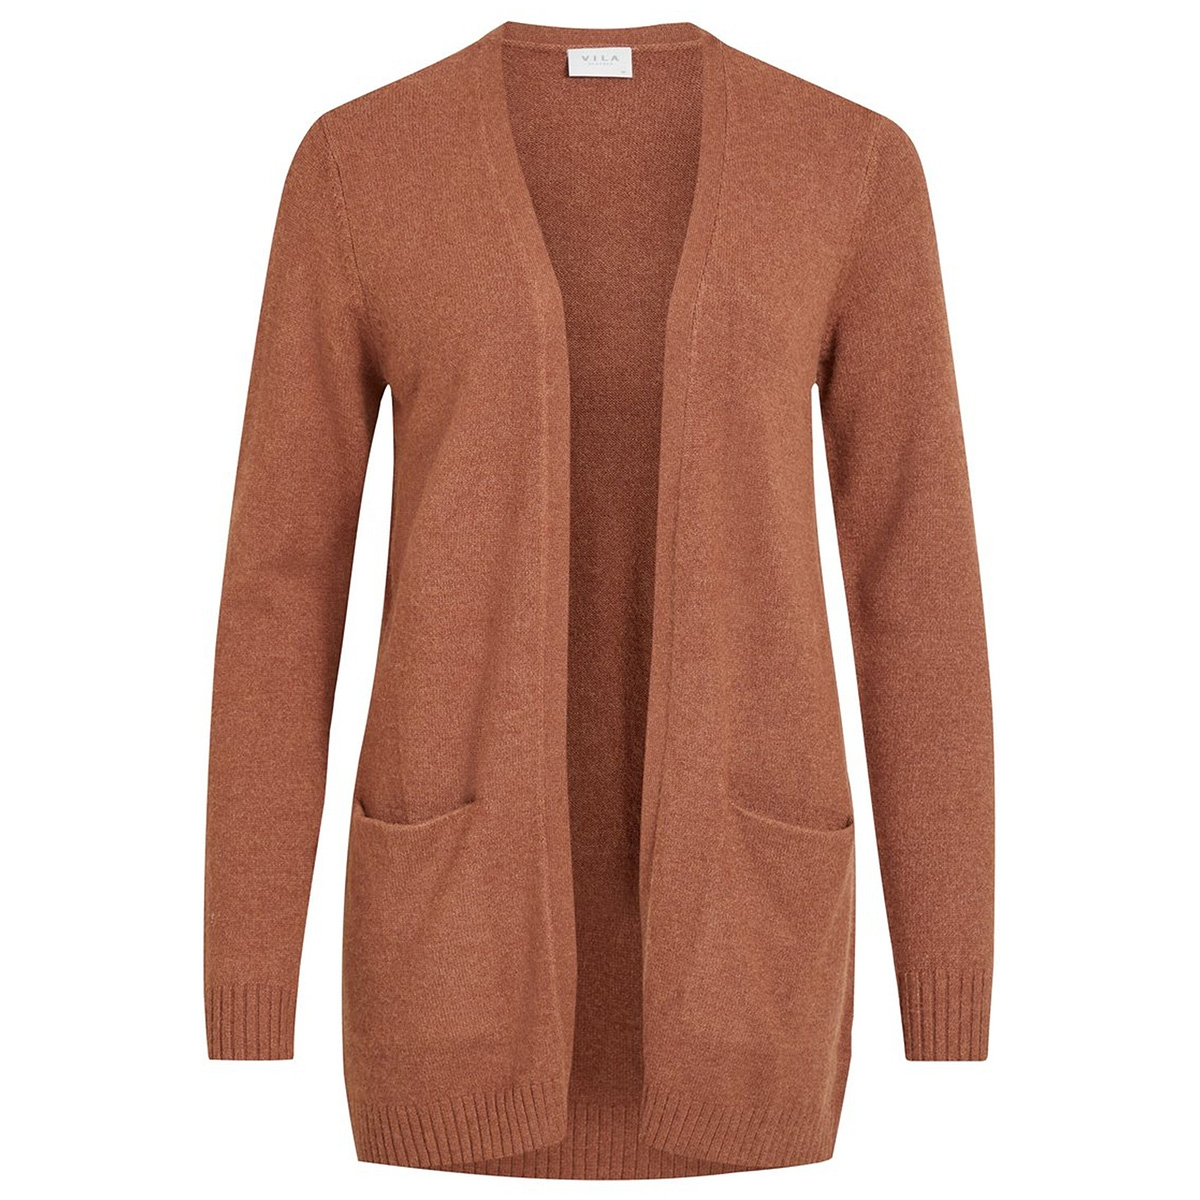 viril l/s open knit cardigan-noos 14044041 vila vest rawhide